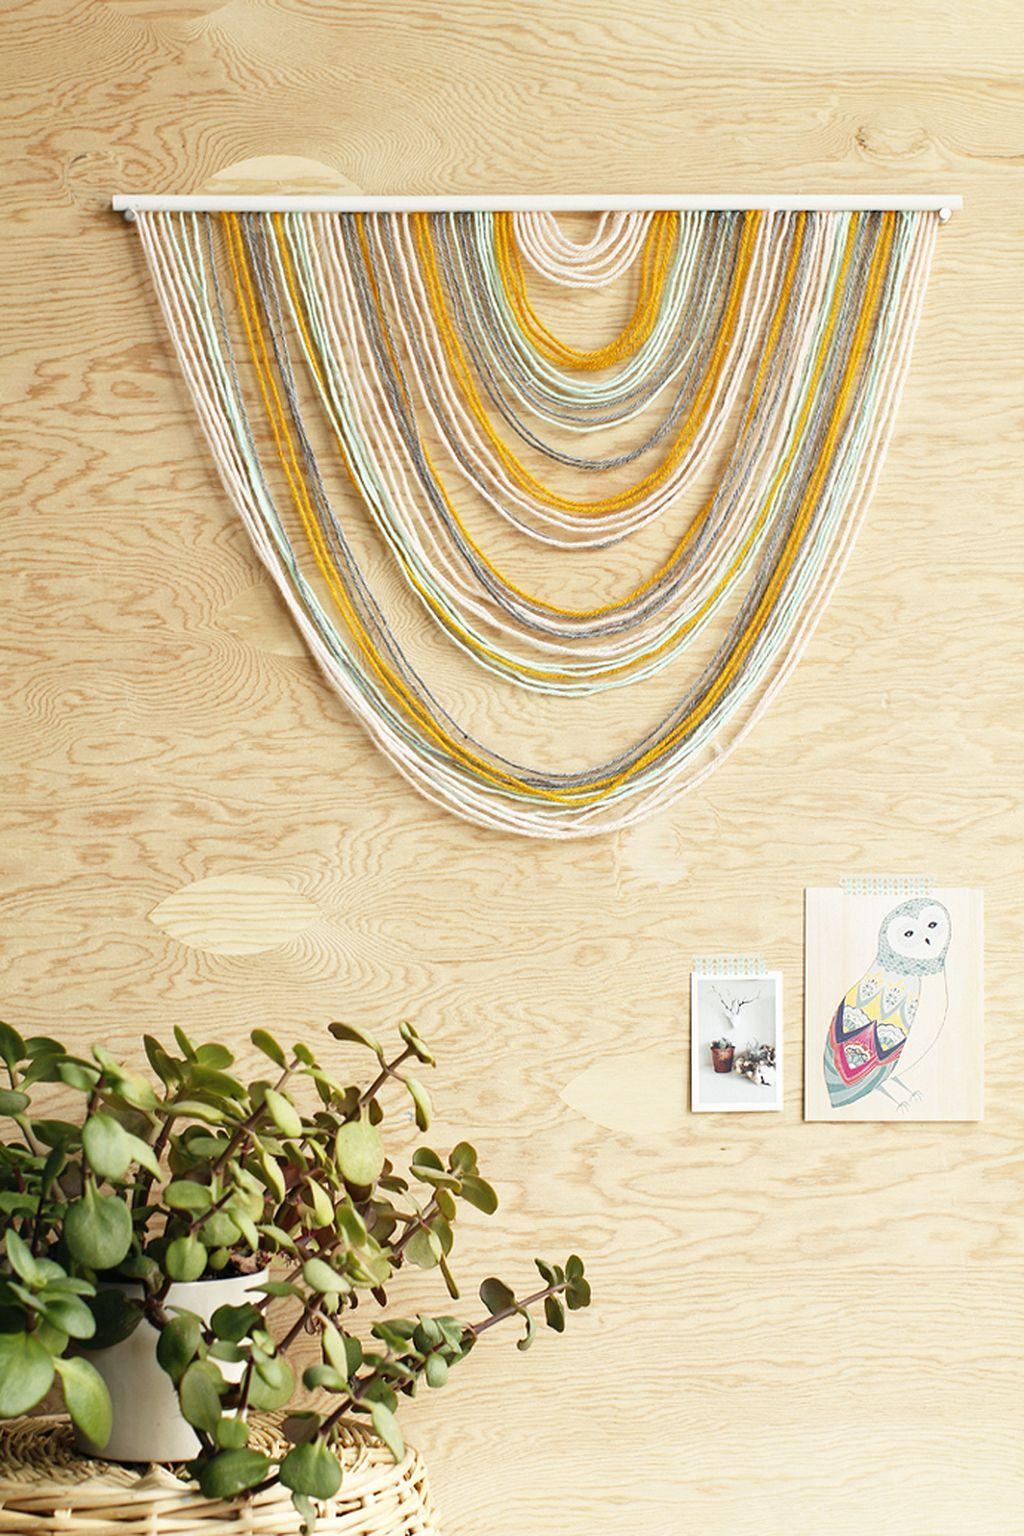 100 Wall Hanging Decor Ideas 5 | my house plants | Pinterest | Wall ...